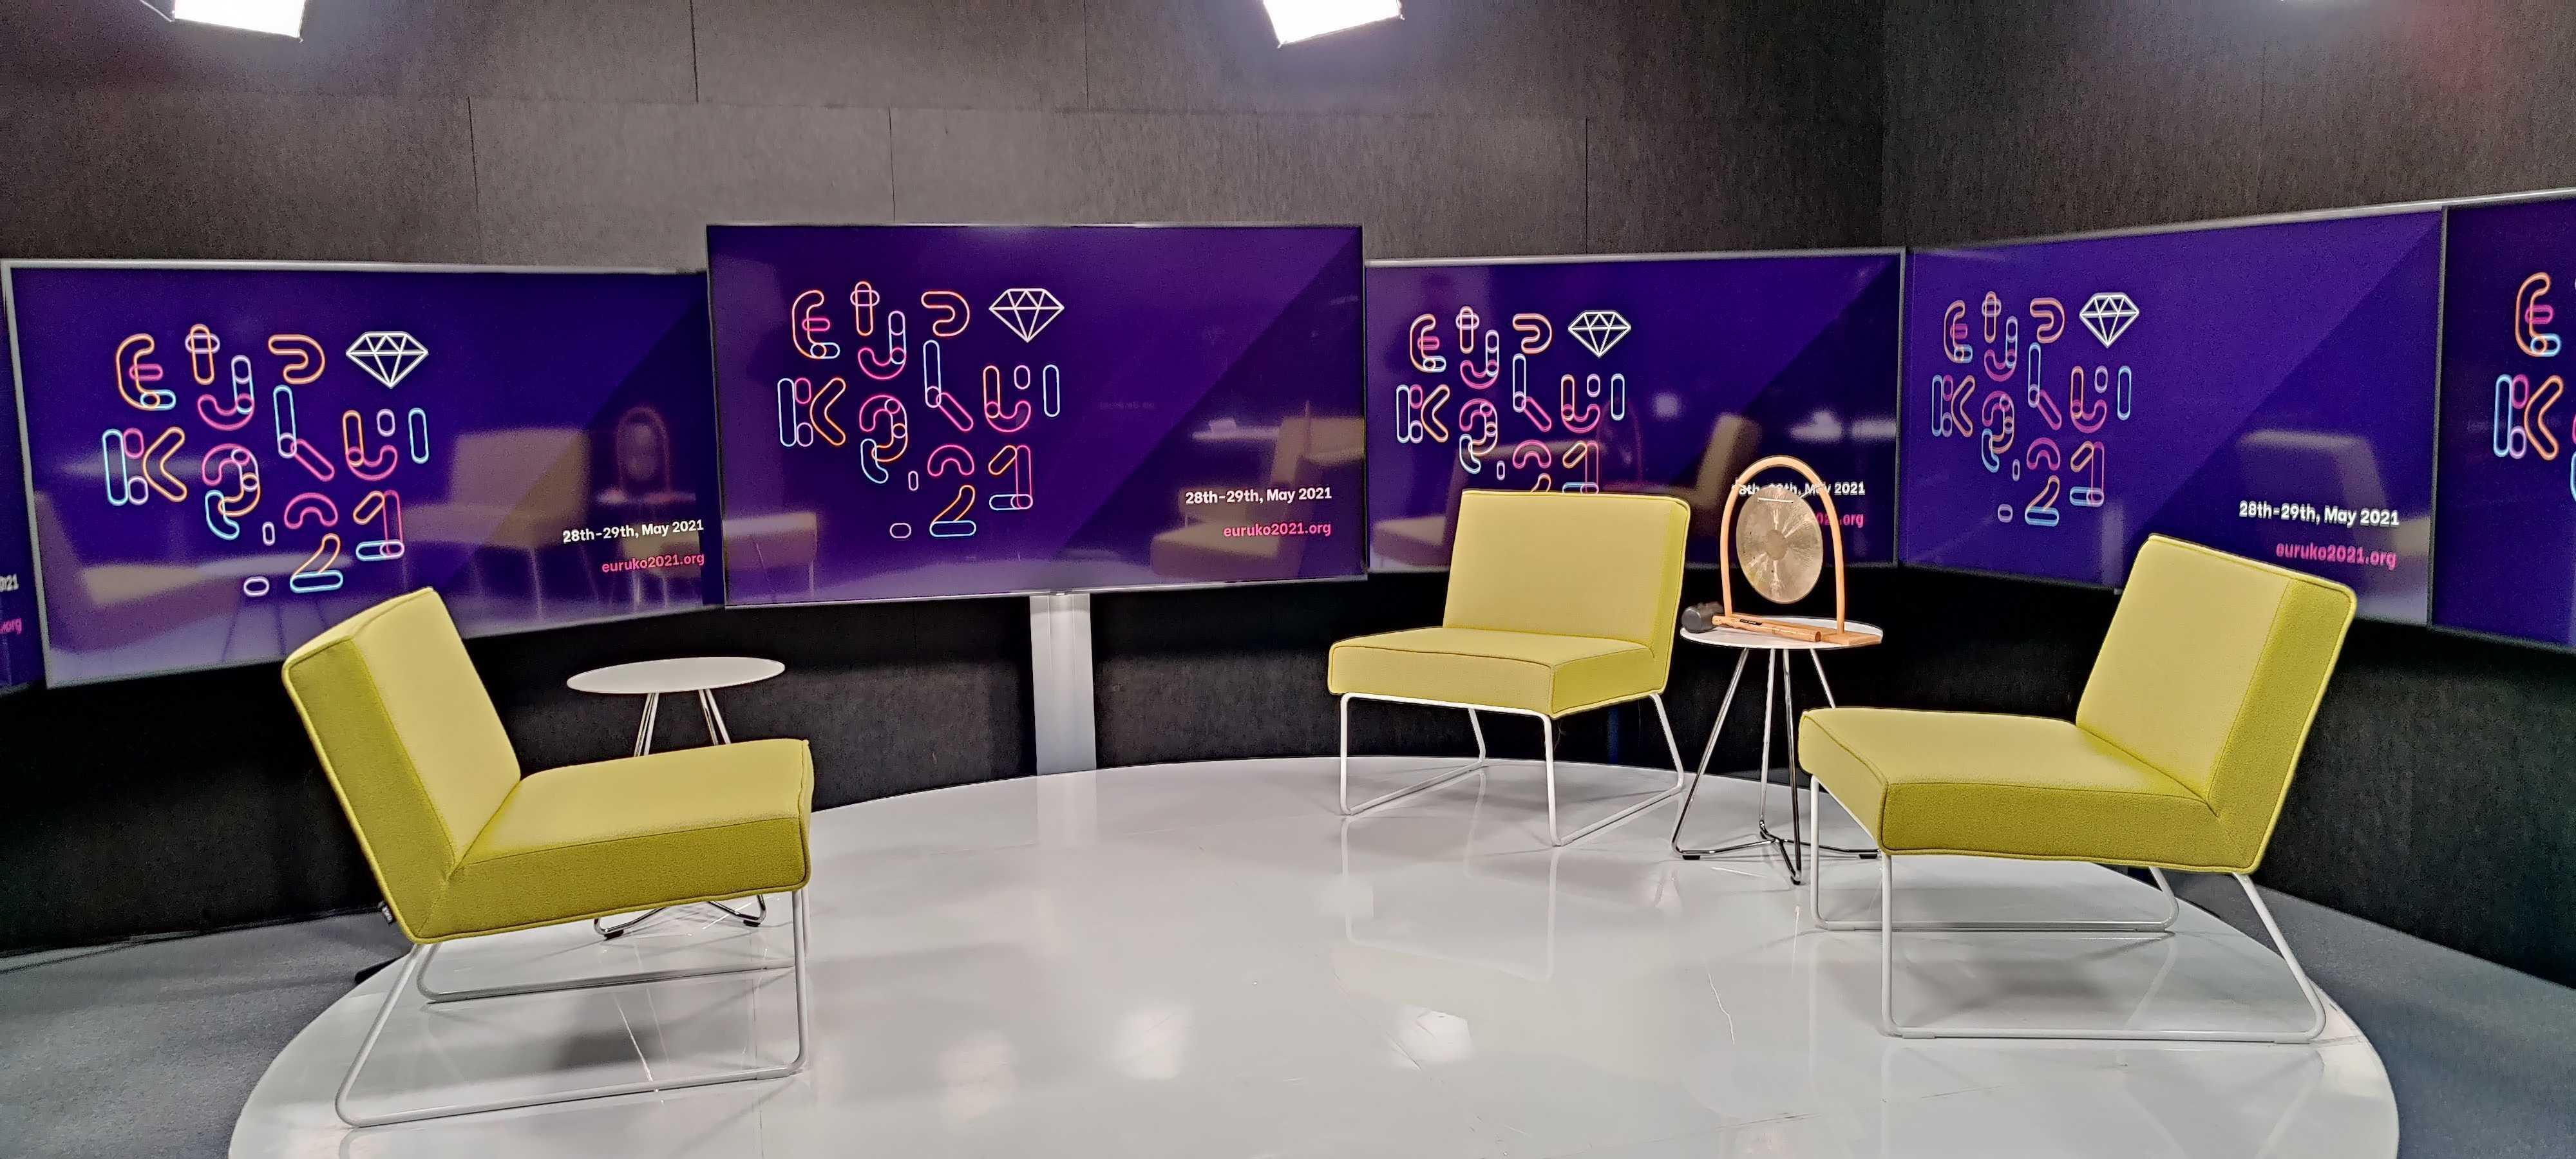 Kisko Euruko 2021 Brella studio